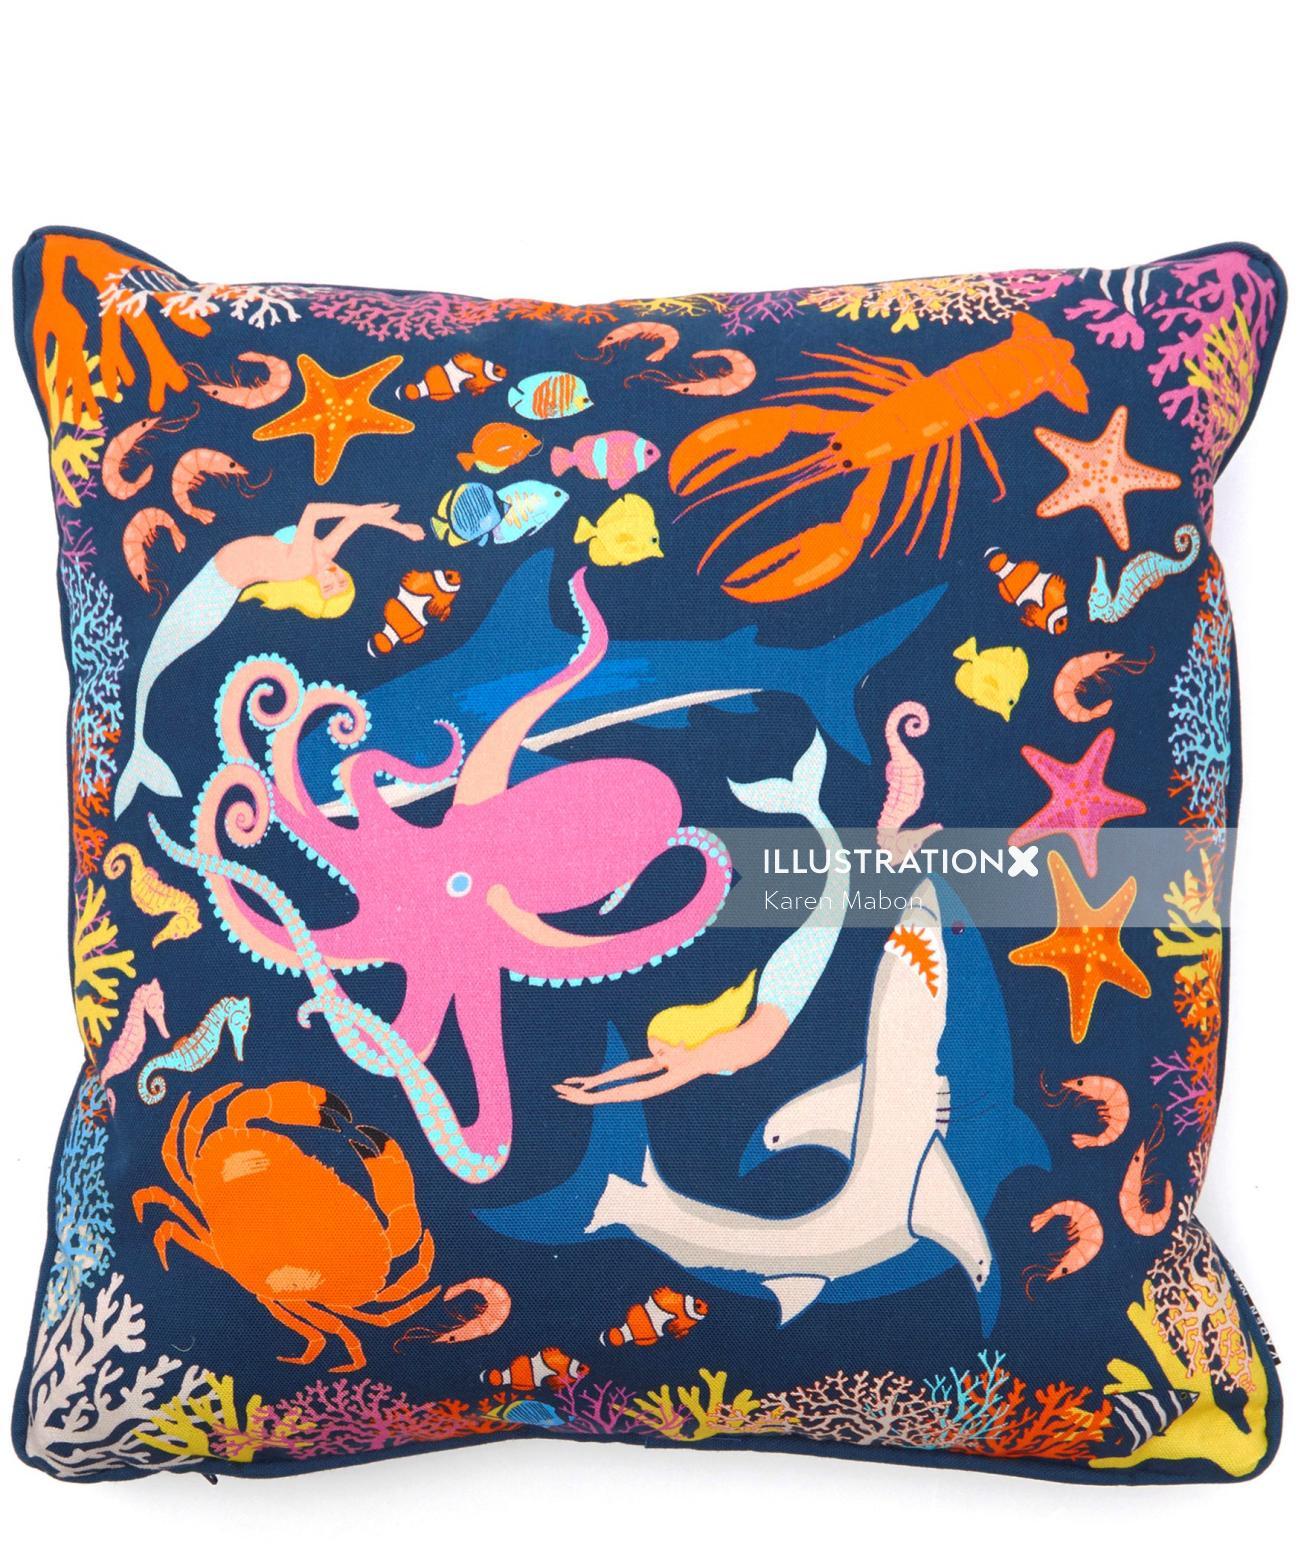 Illustration of Under the sea cushion